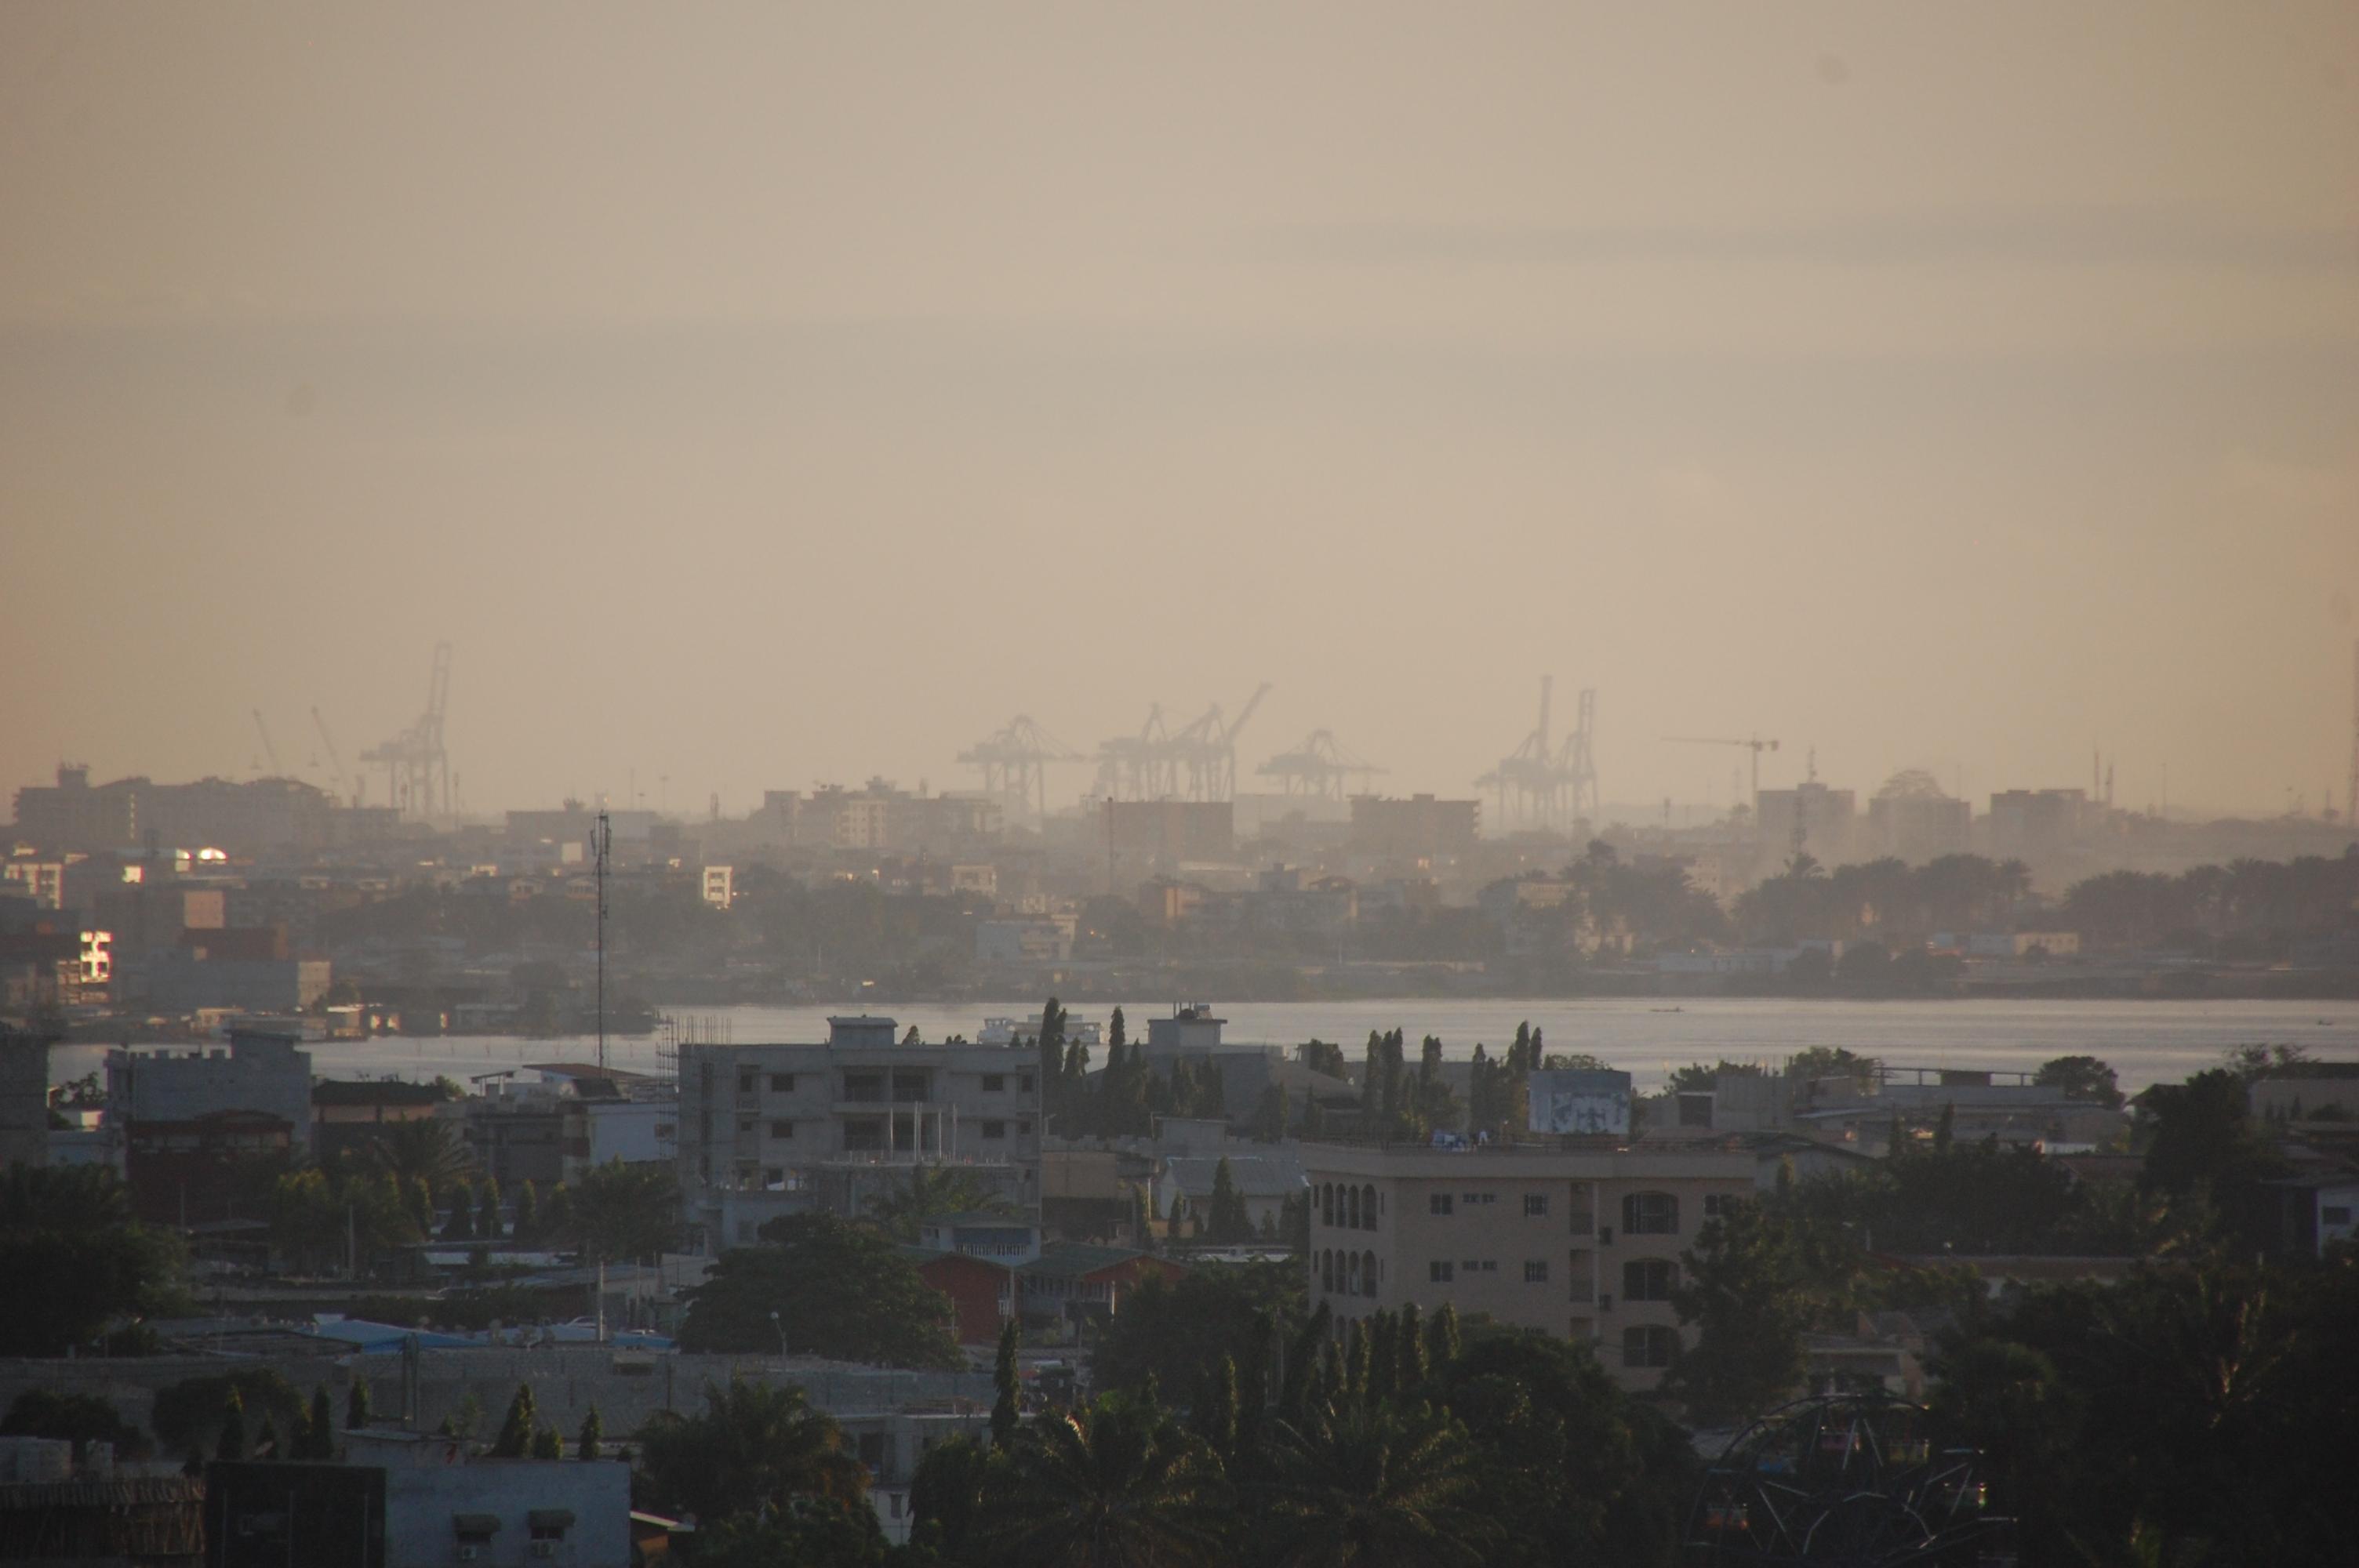 port d'Abidjan commerce international de cocaine